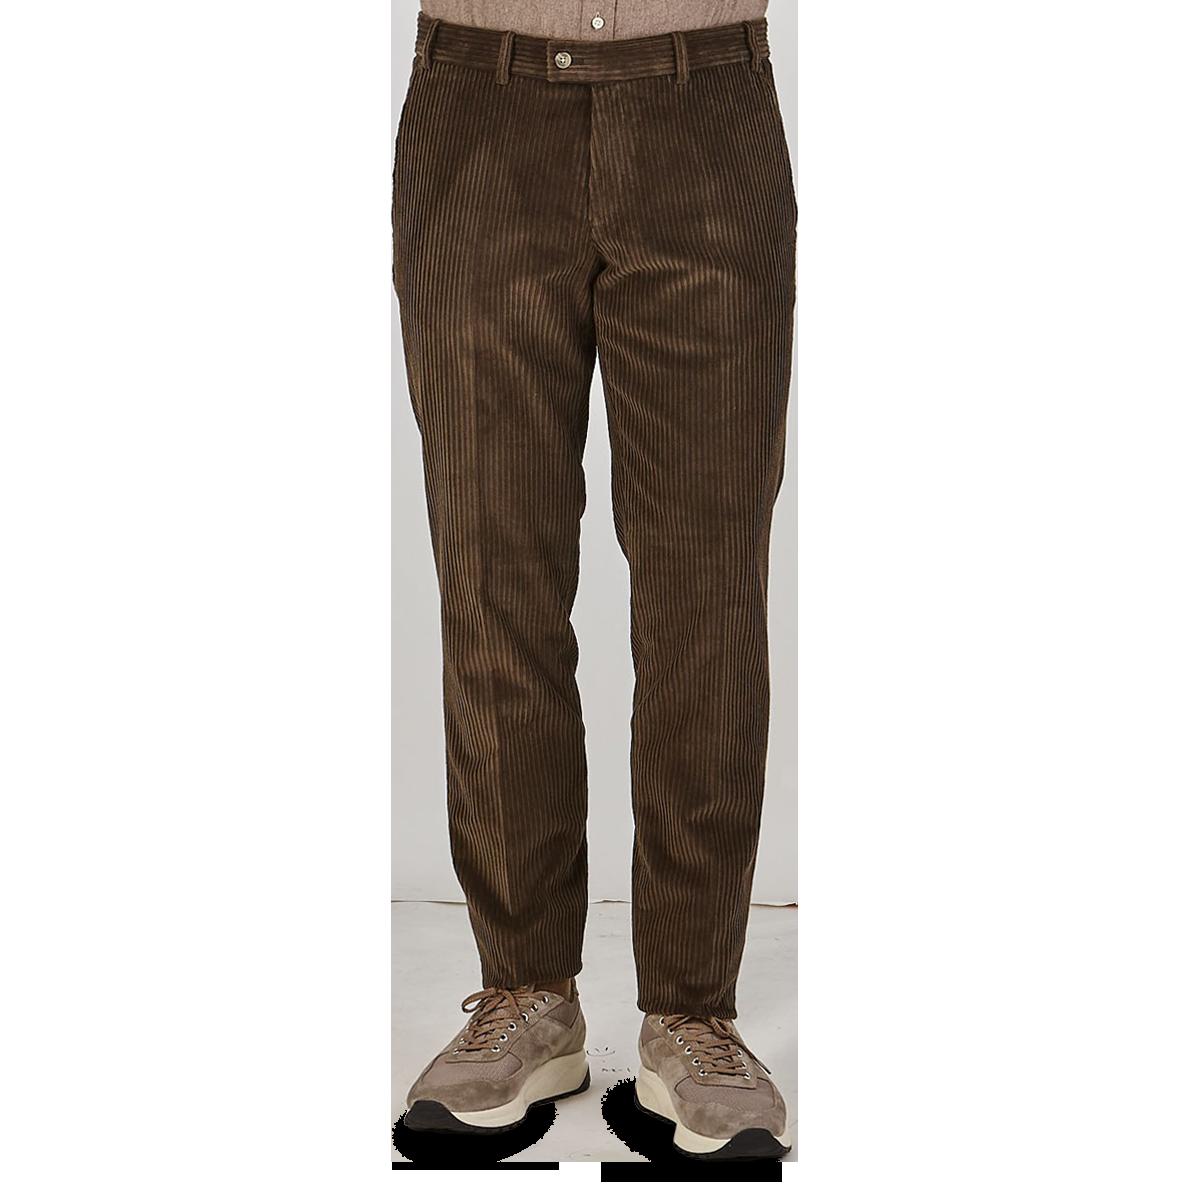 Hiltl Brown Wide Wale Corduroy Slim Trousers Front